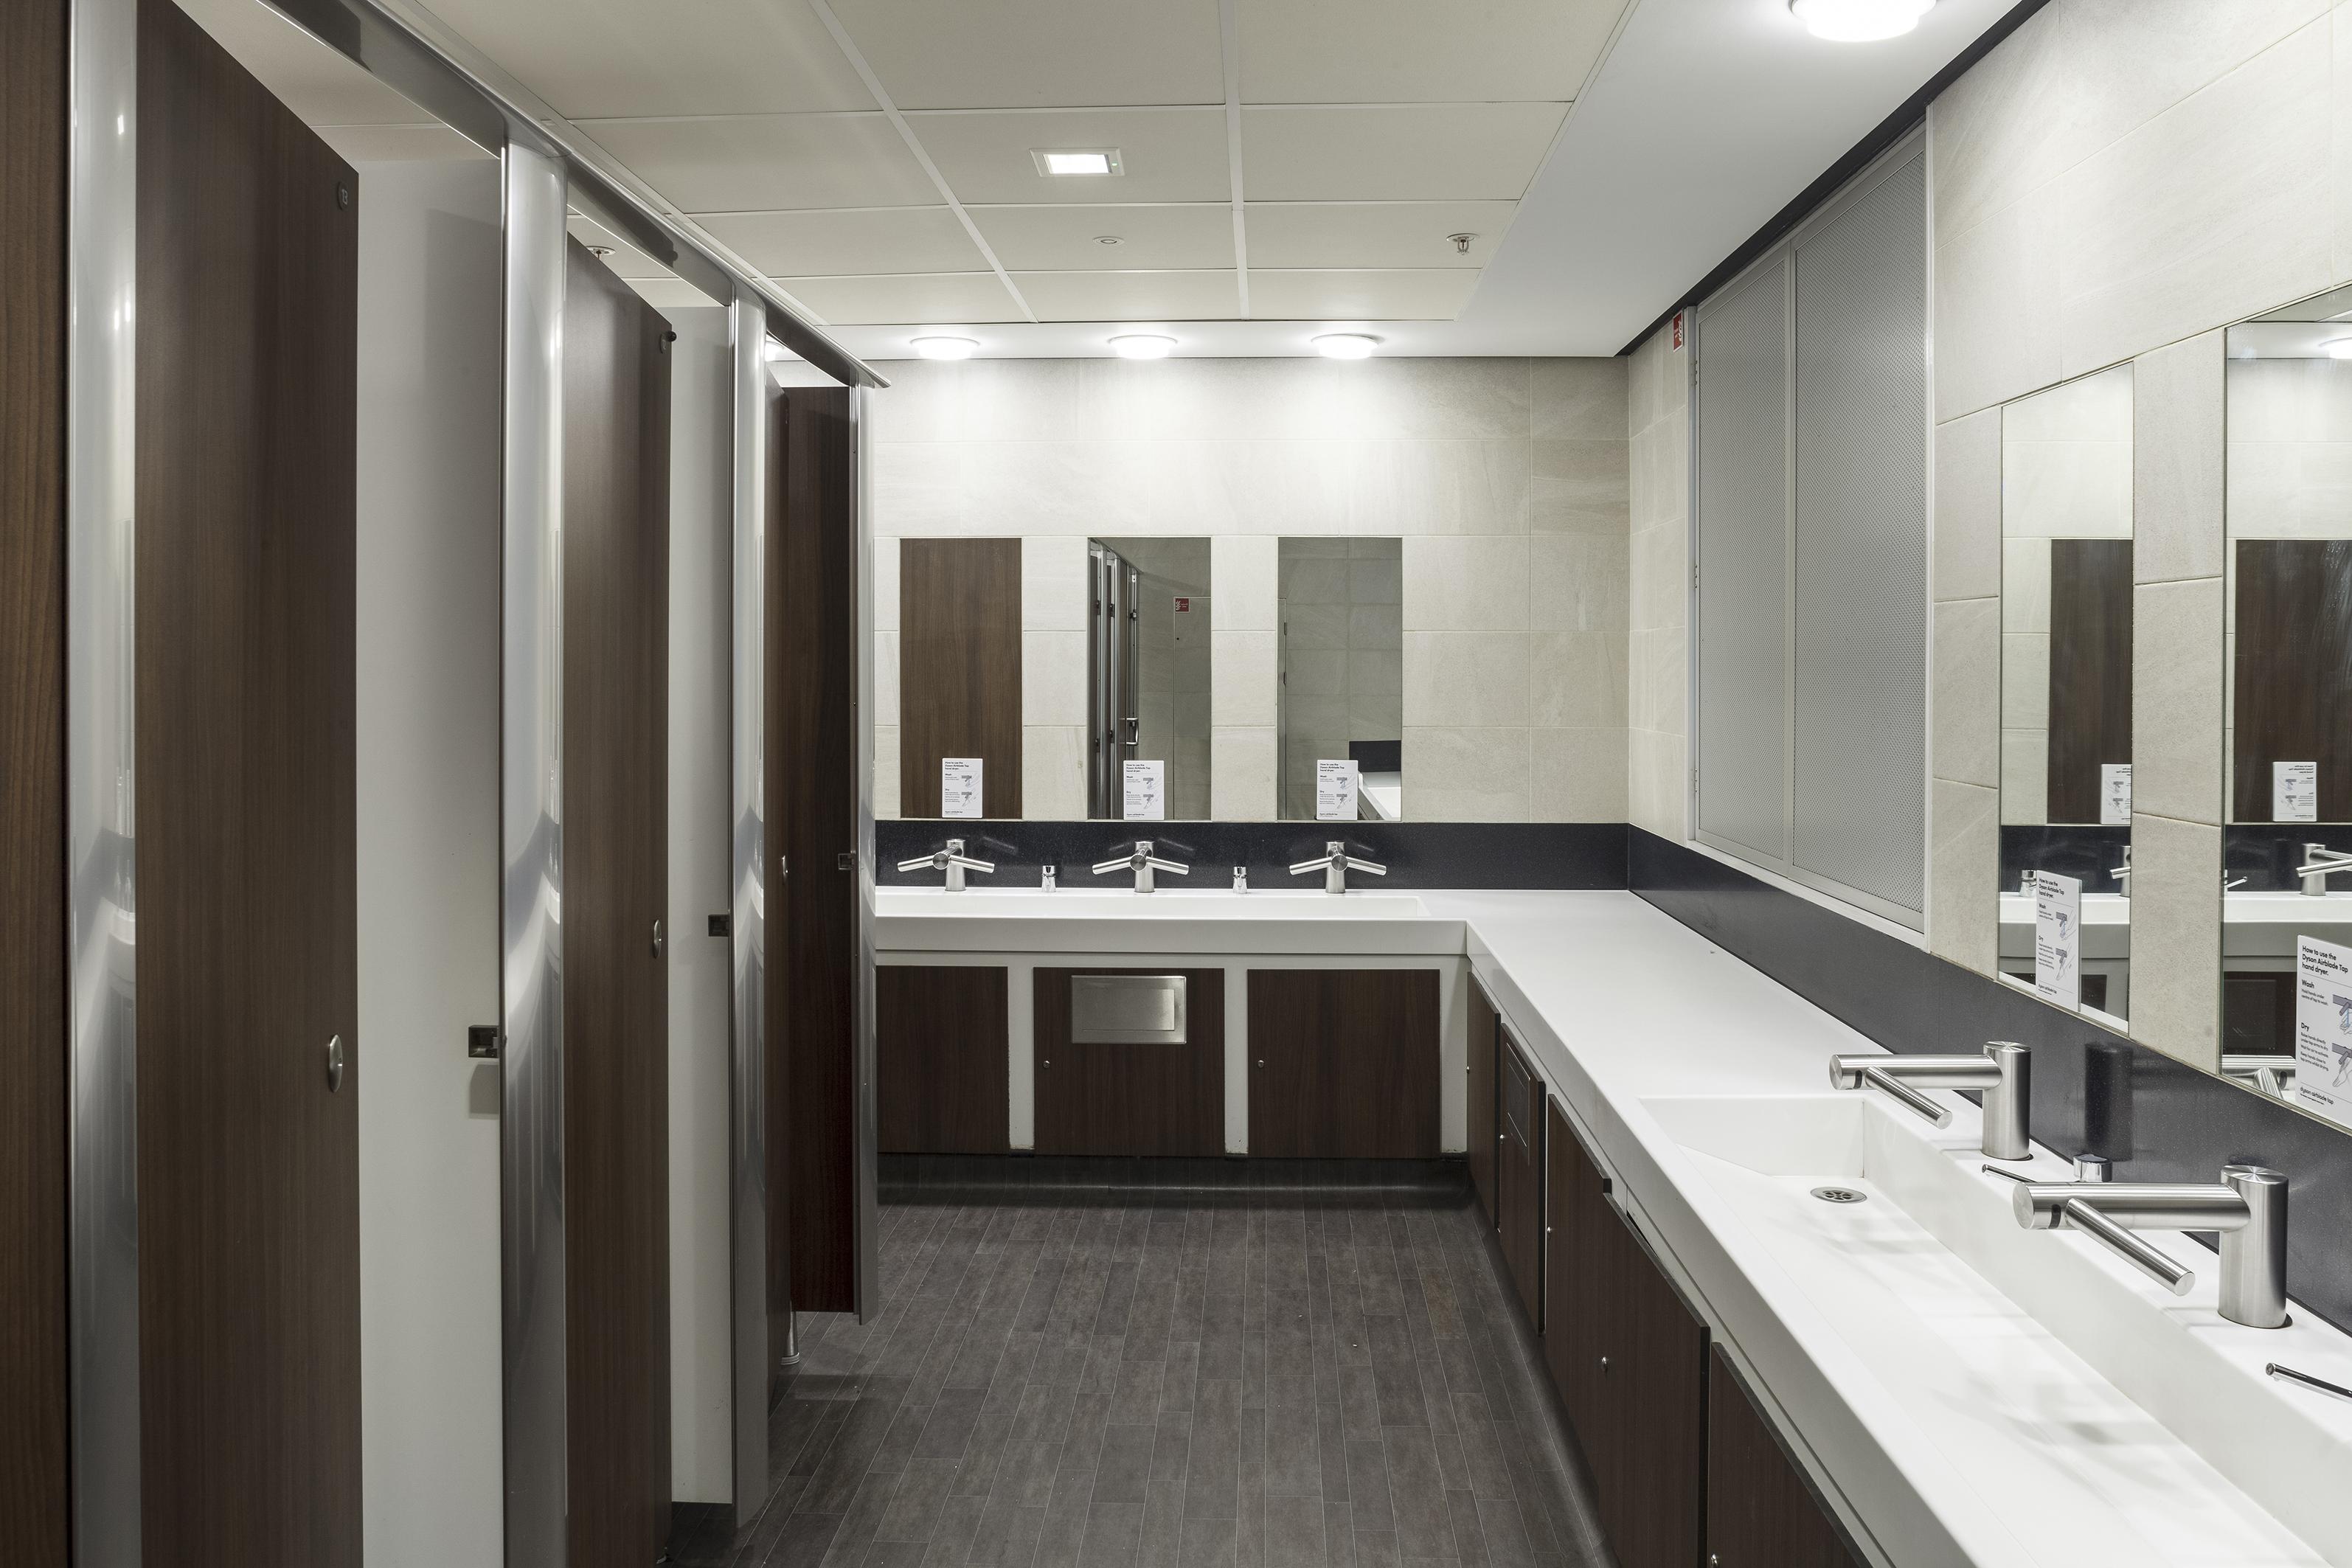 Venesta Washrooms For The London Eye